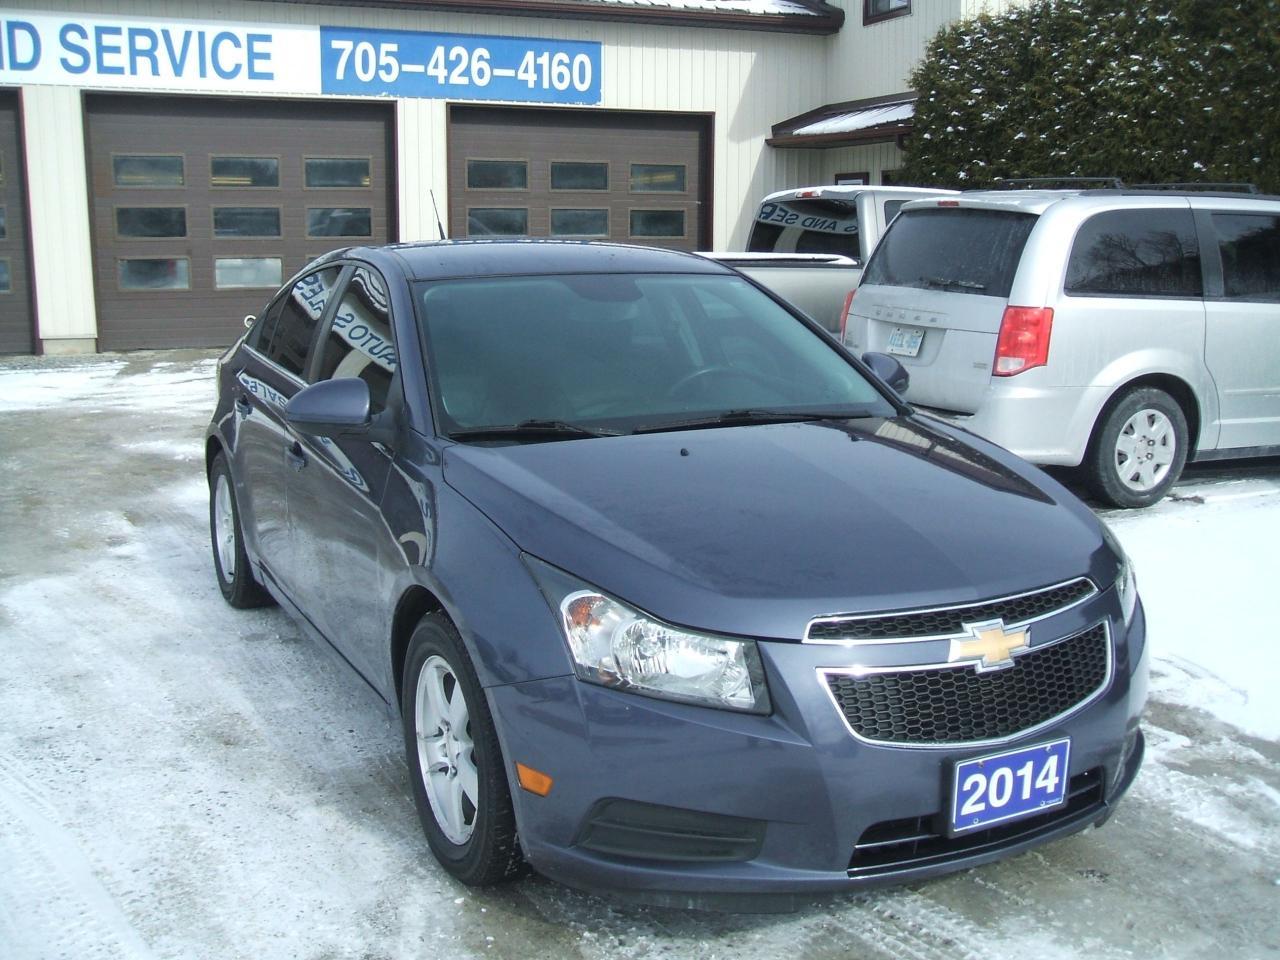 Photo of Blue 2014 Chevrolet Cruze